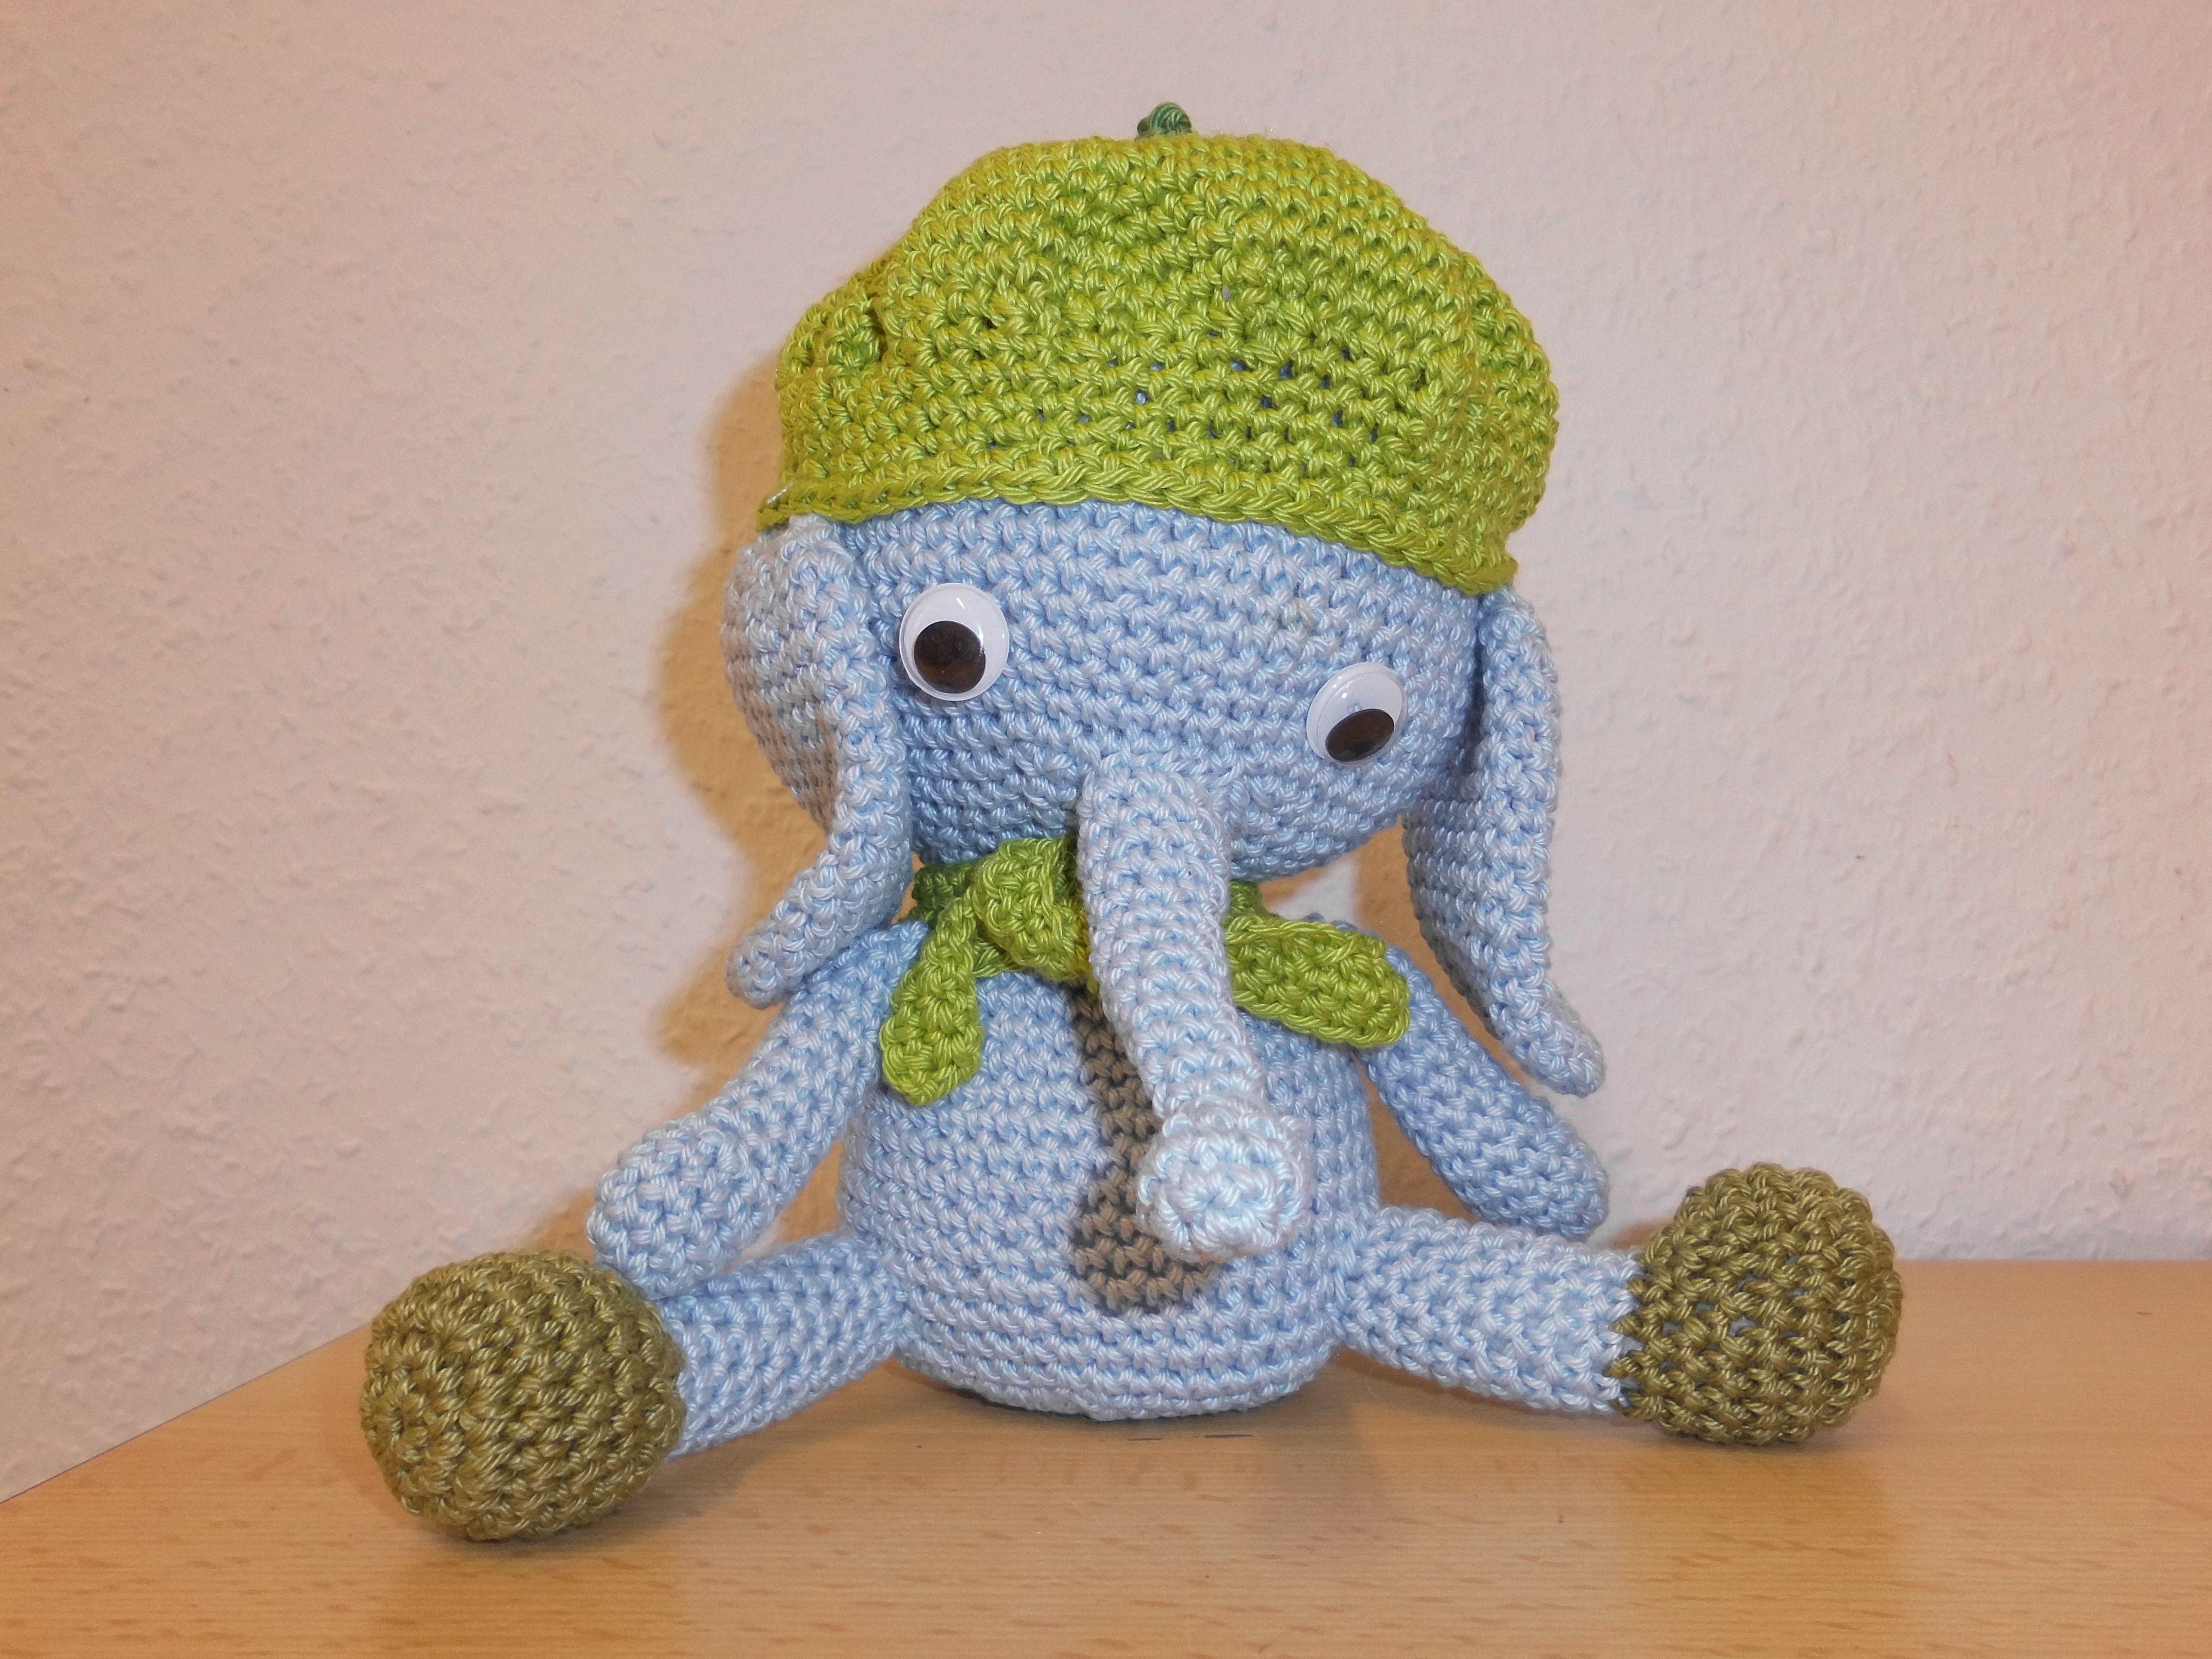 Elefant, DIY, Dumbo, Häkeltier, Selbstgemachtes, Kuscheltier ...